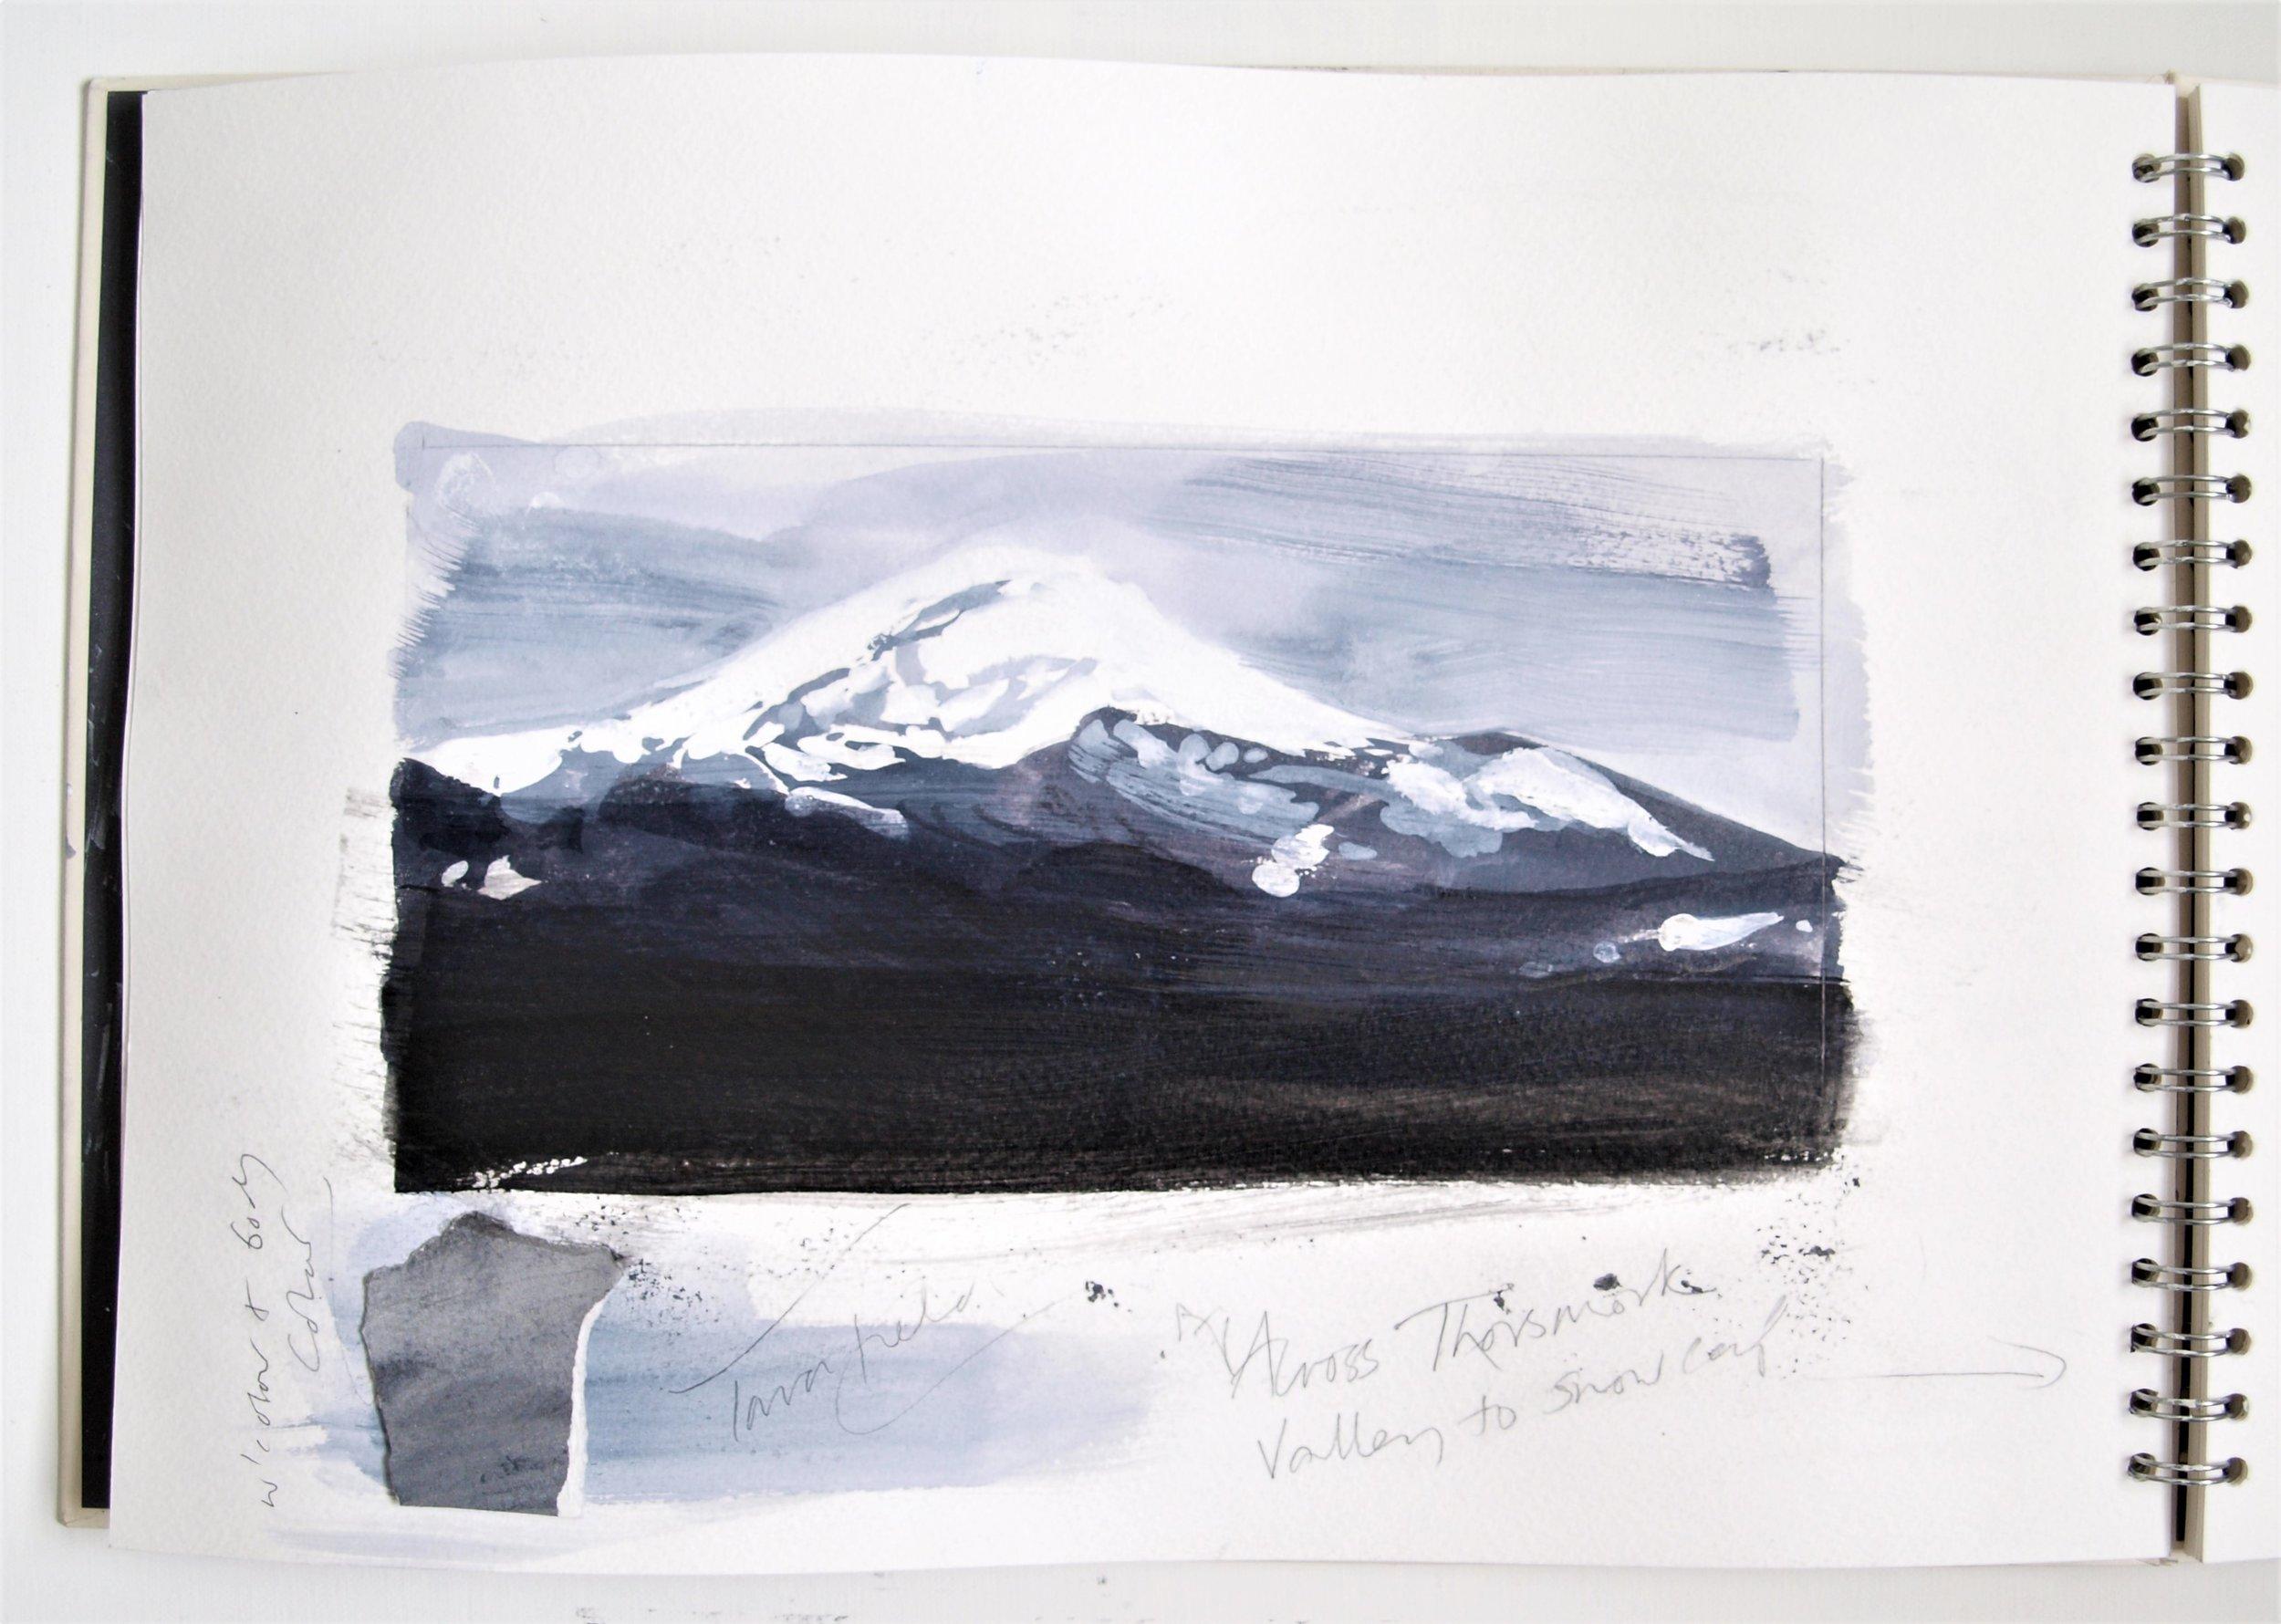 ICELAND LIGHT INTO DARK Sketchbook 2016 (page 7) C.G.GUEST.JPG